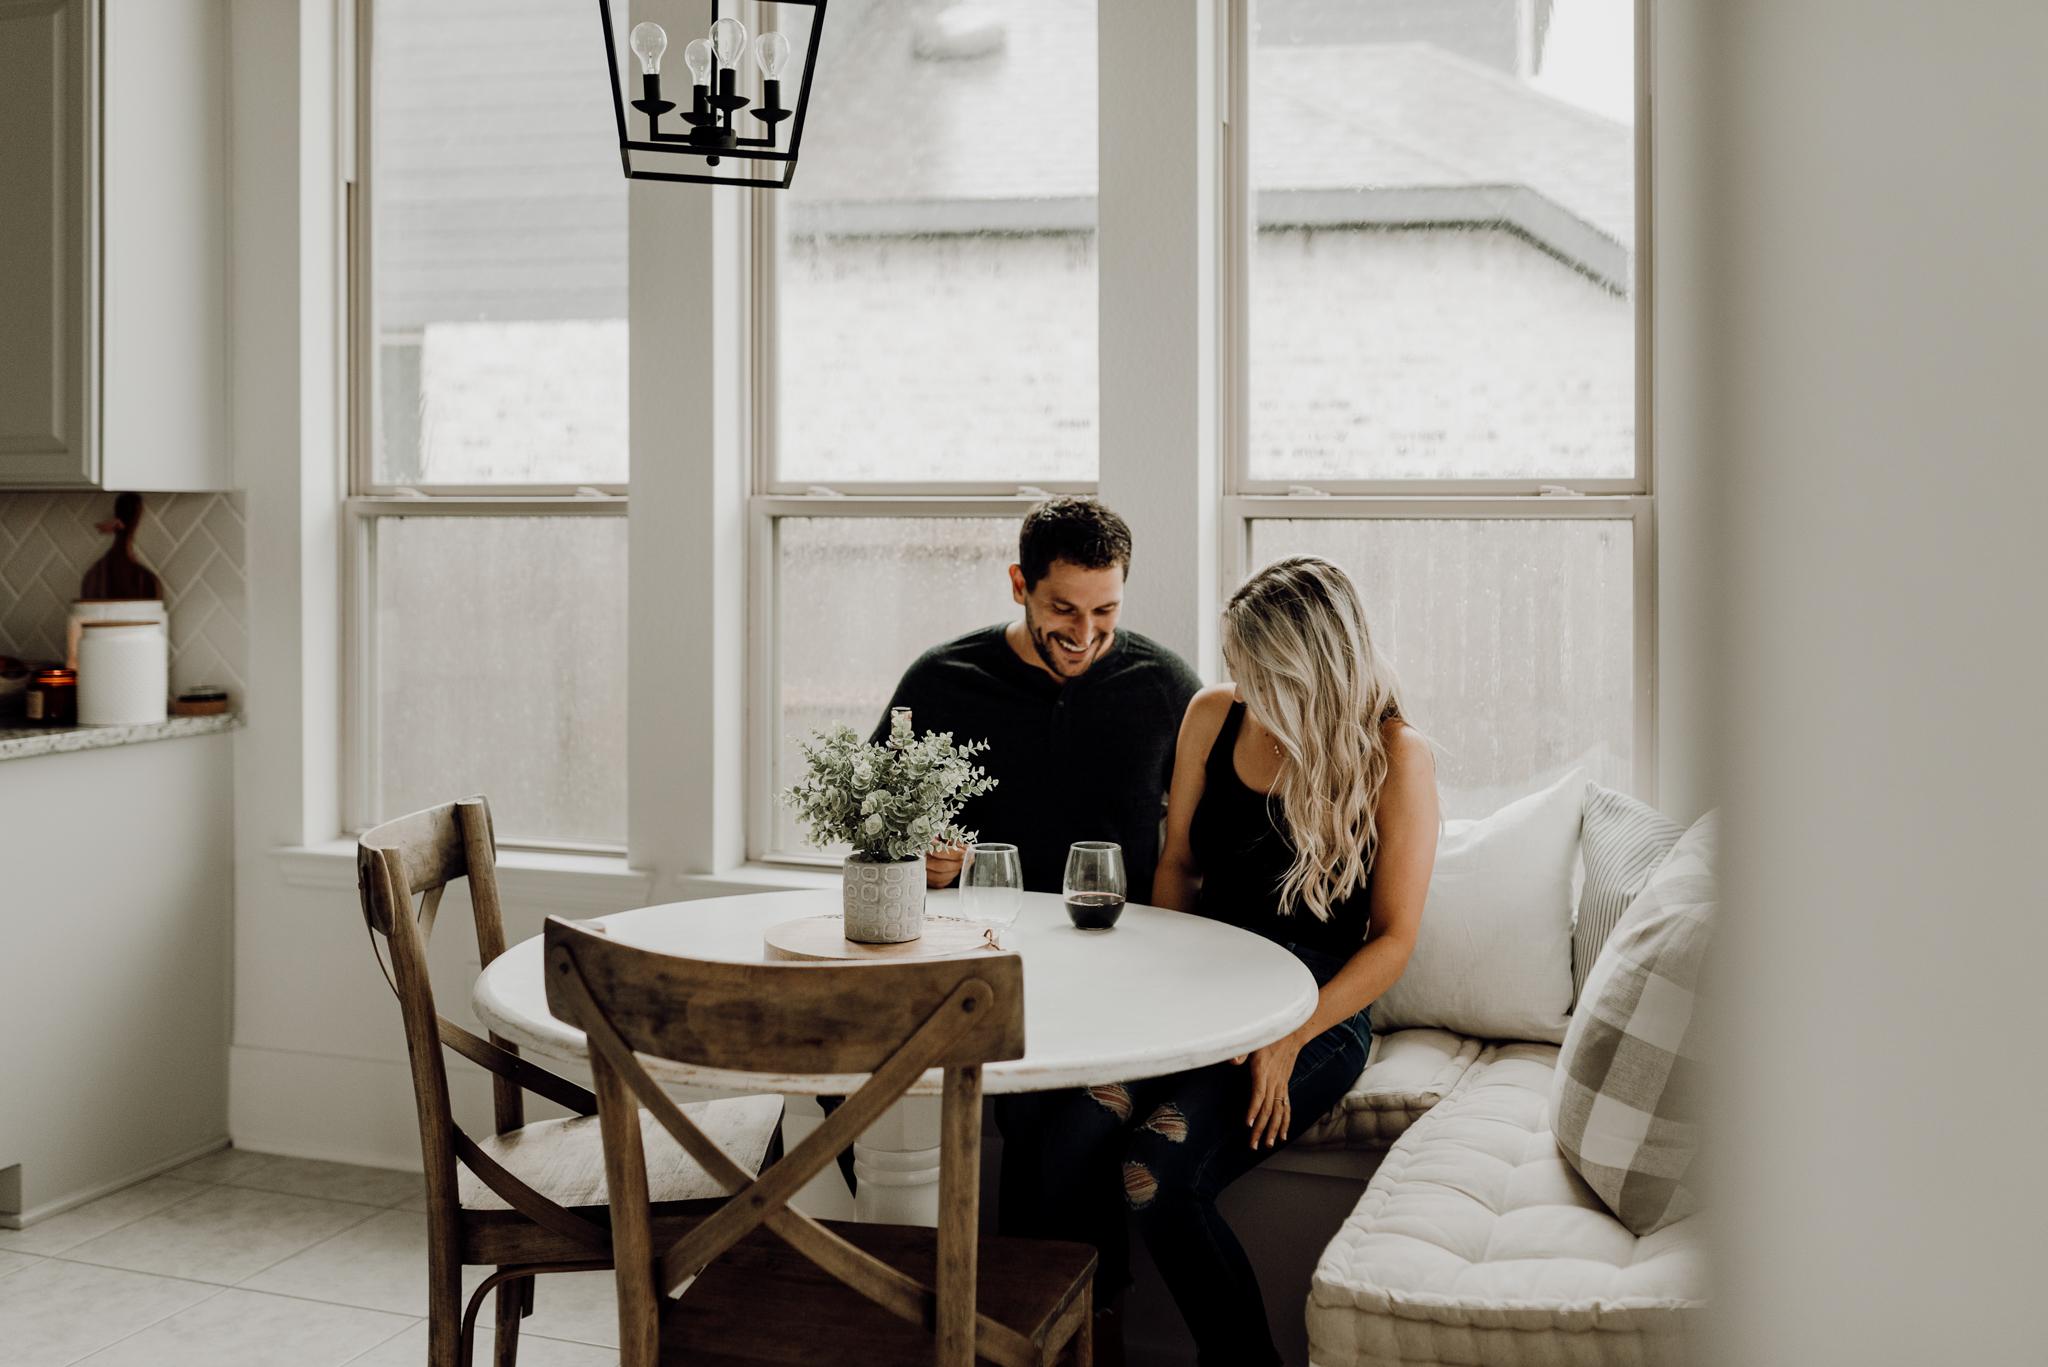 Houston Wedding Photographer-Houston In Home Engagement Session- Houston Wedding Photographer -Kristen Giles Photography-108.jpg